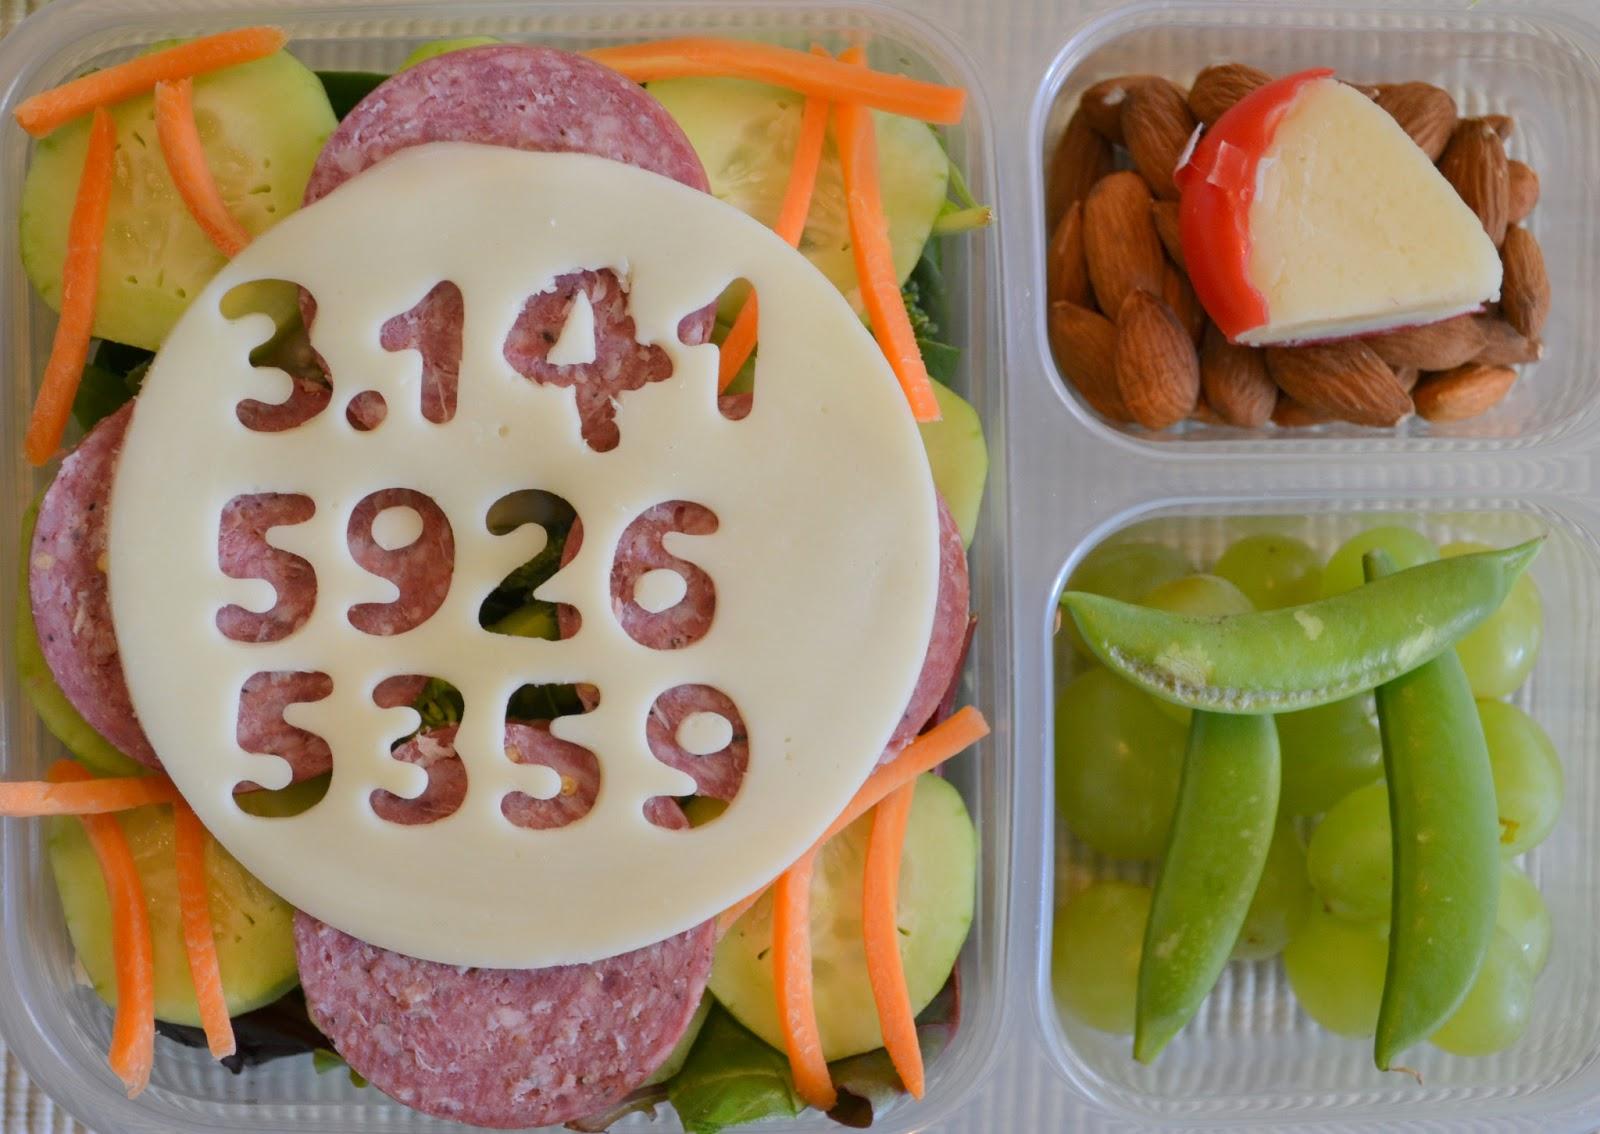 http://robotsquirrelandthemonkeys.blogspot.com/2013/03/bring-me-some-edible-geekery-blog-hop.html#.UyN12IVYzBY